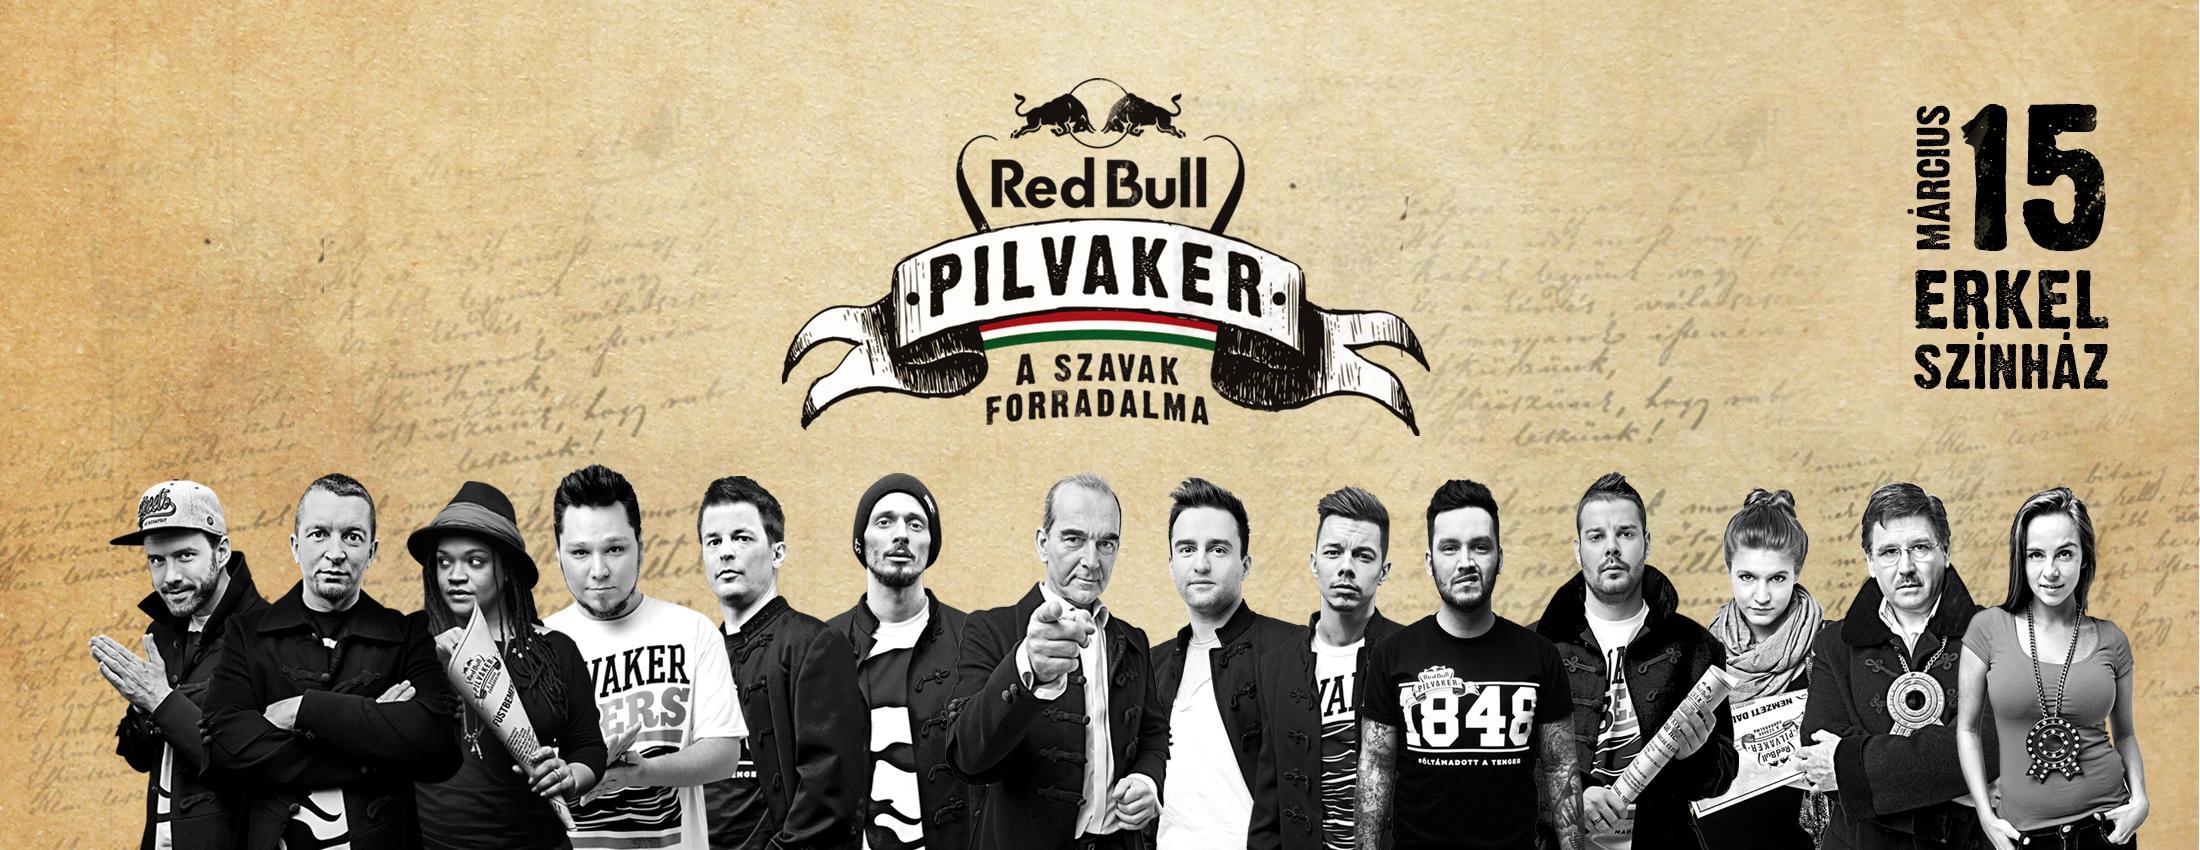 pilvaker_team_2.jpg